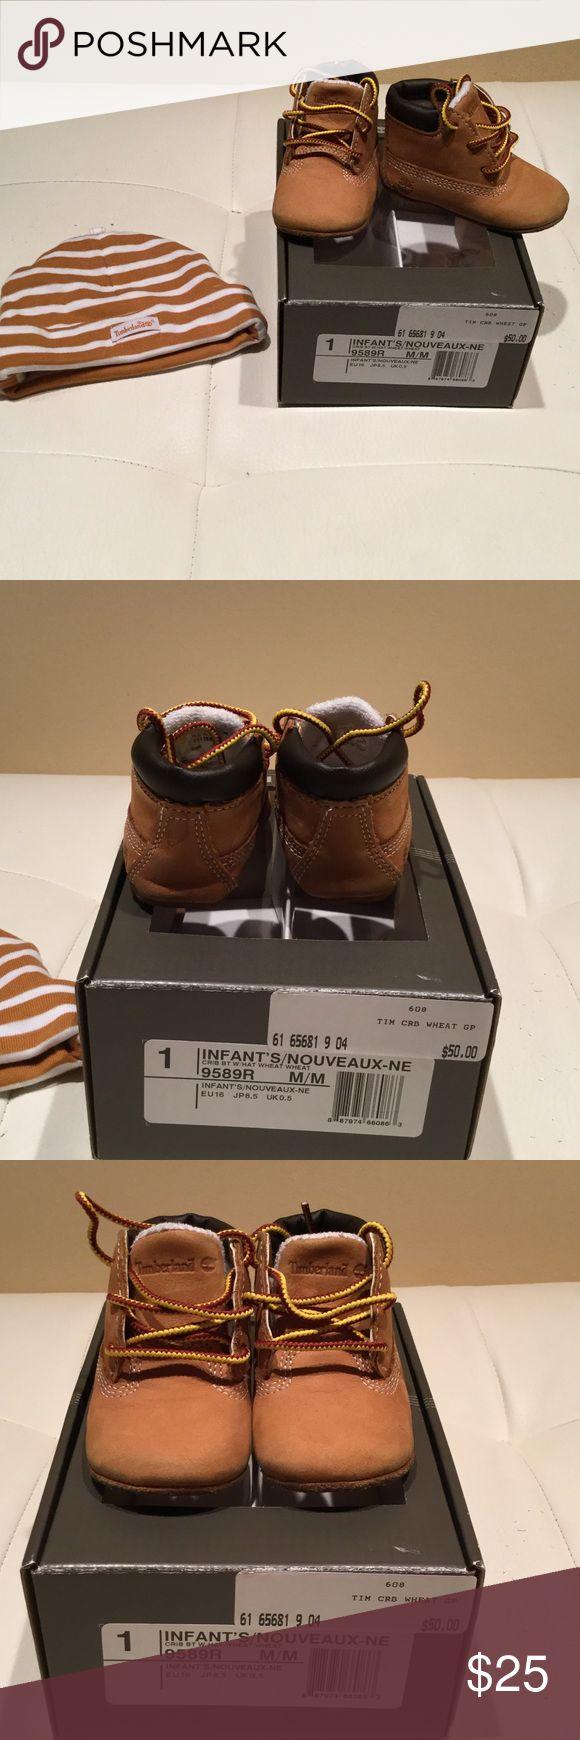 Spotted while shopping on Poshmark: 💥AUTHENTIC 💥 Infant Timberland Boot & Hat Set! #poshmark #fashion #shopping #style #Timberland #Other